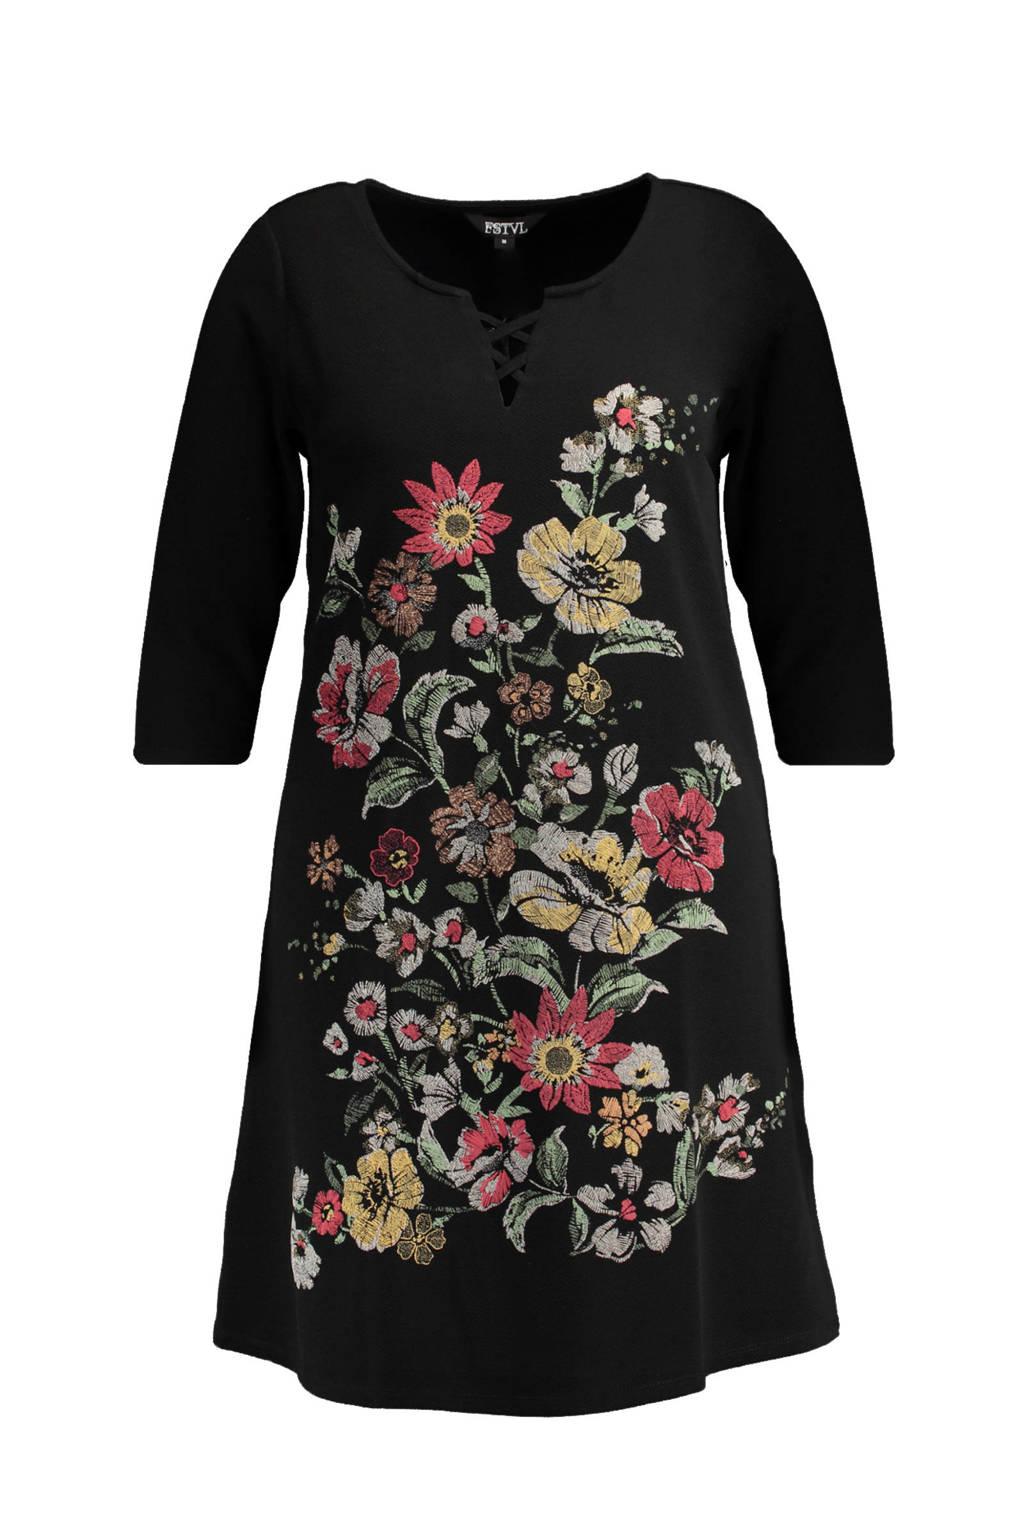 MS Mode jurk met bloemenprint zwart, Zwart